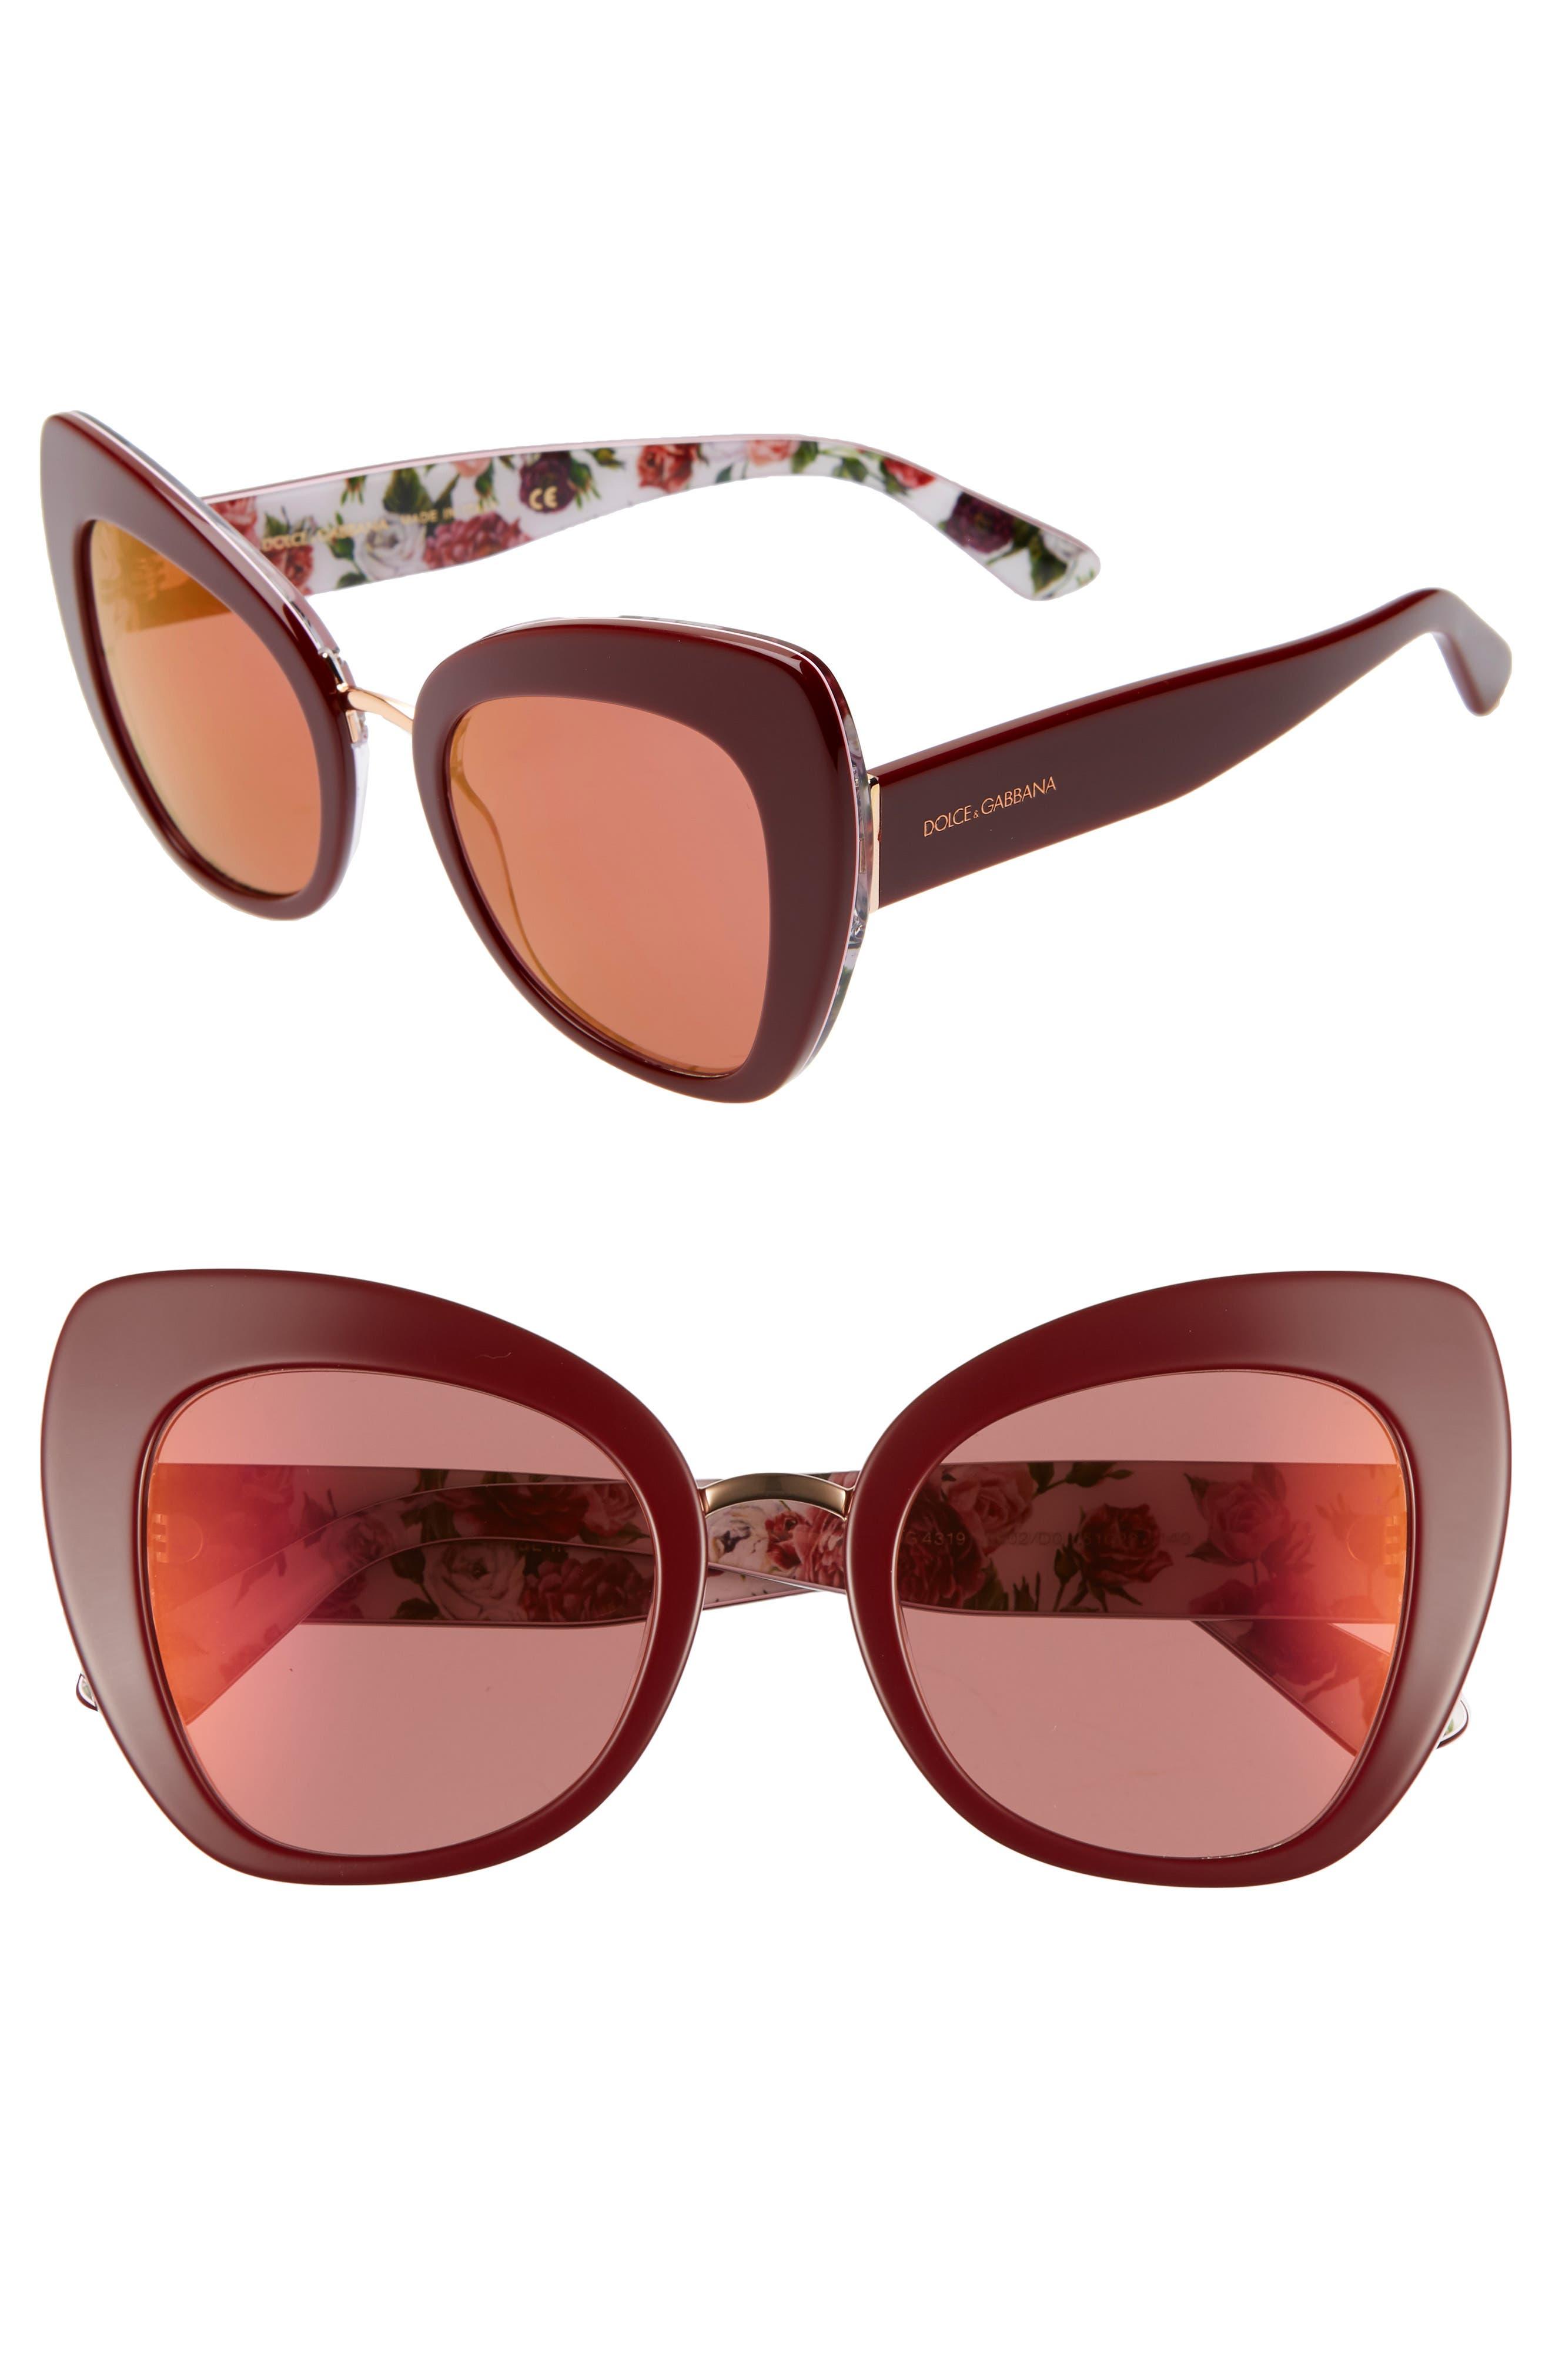 51mm Mirrored Cat Eye Sunglasses,                         Main,                         color, PURPLE/ RED MIRROR